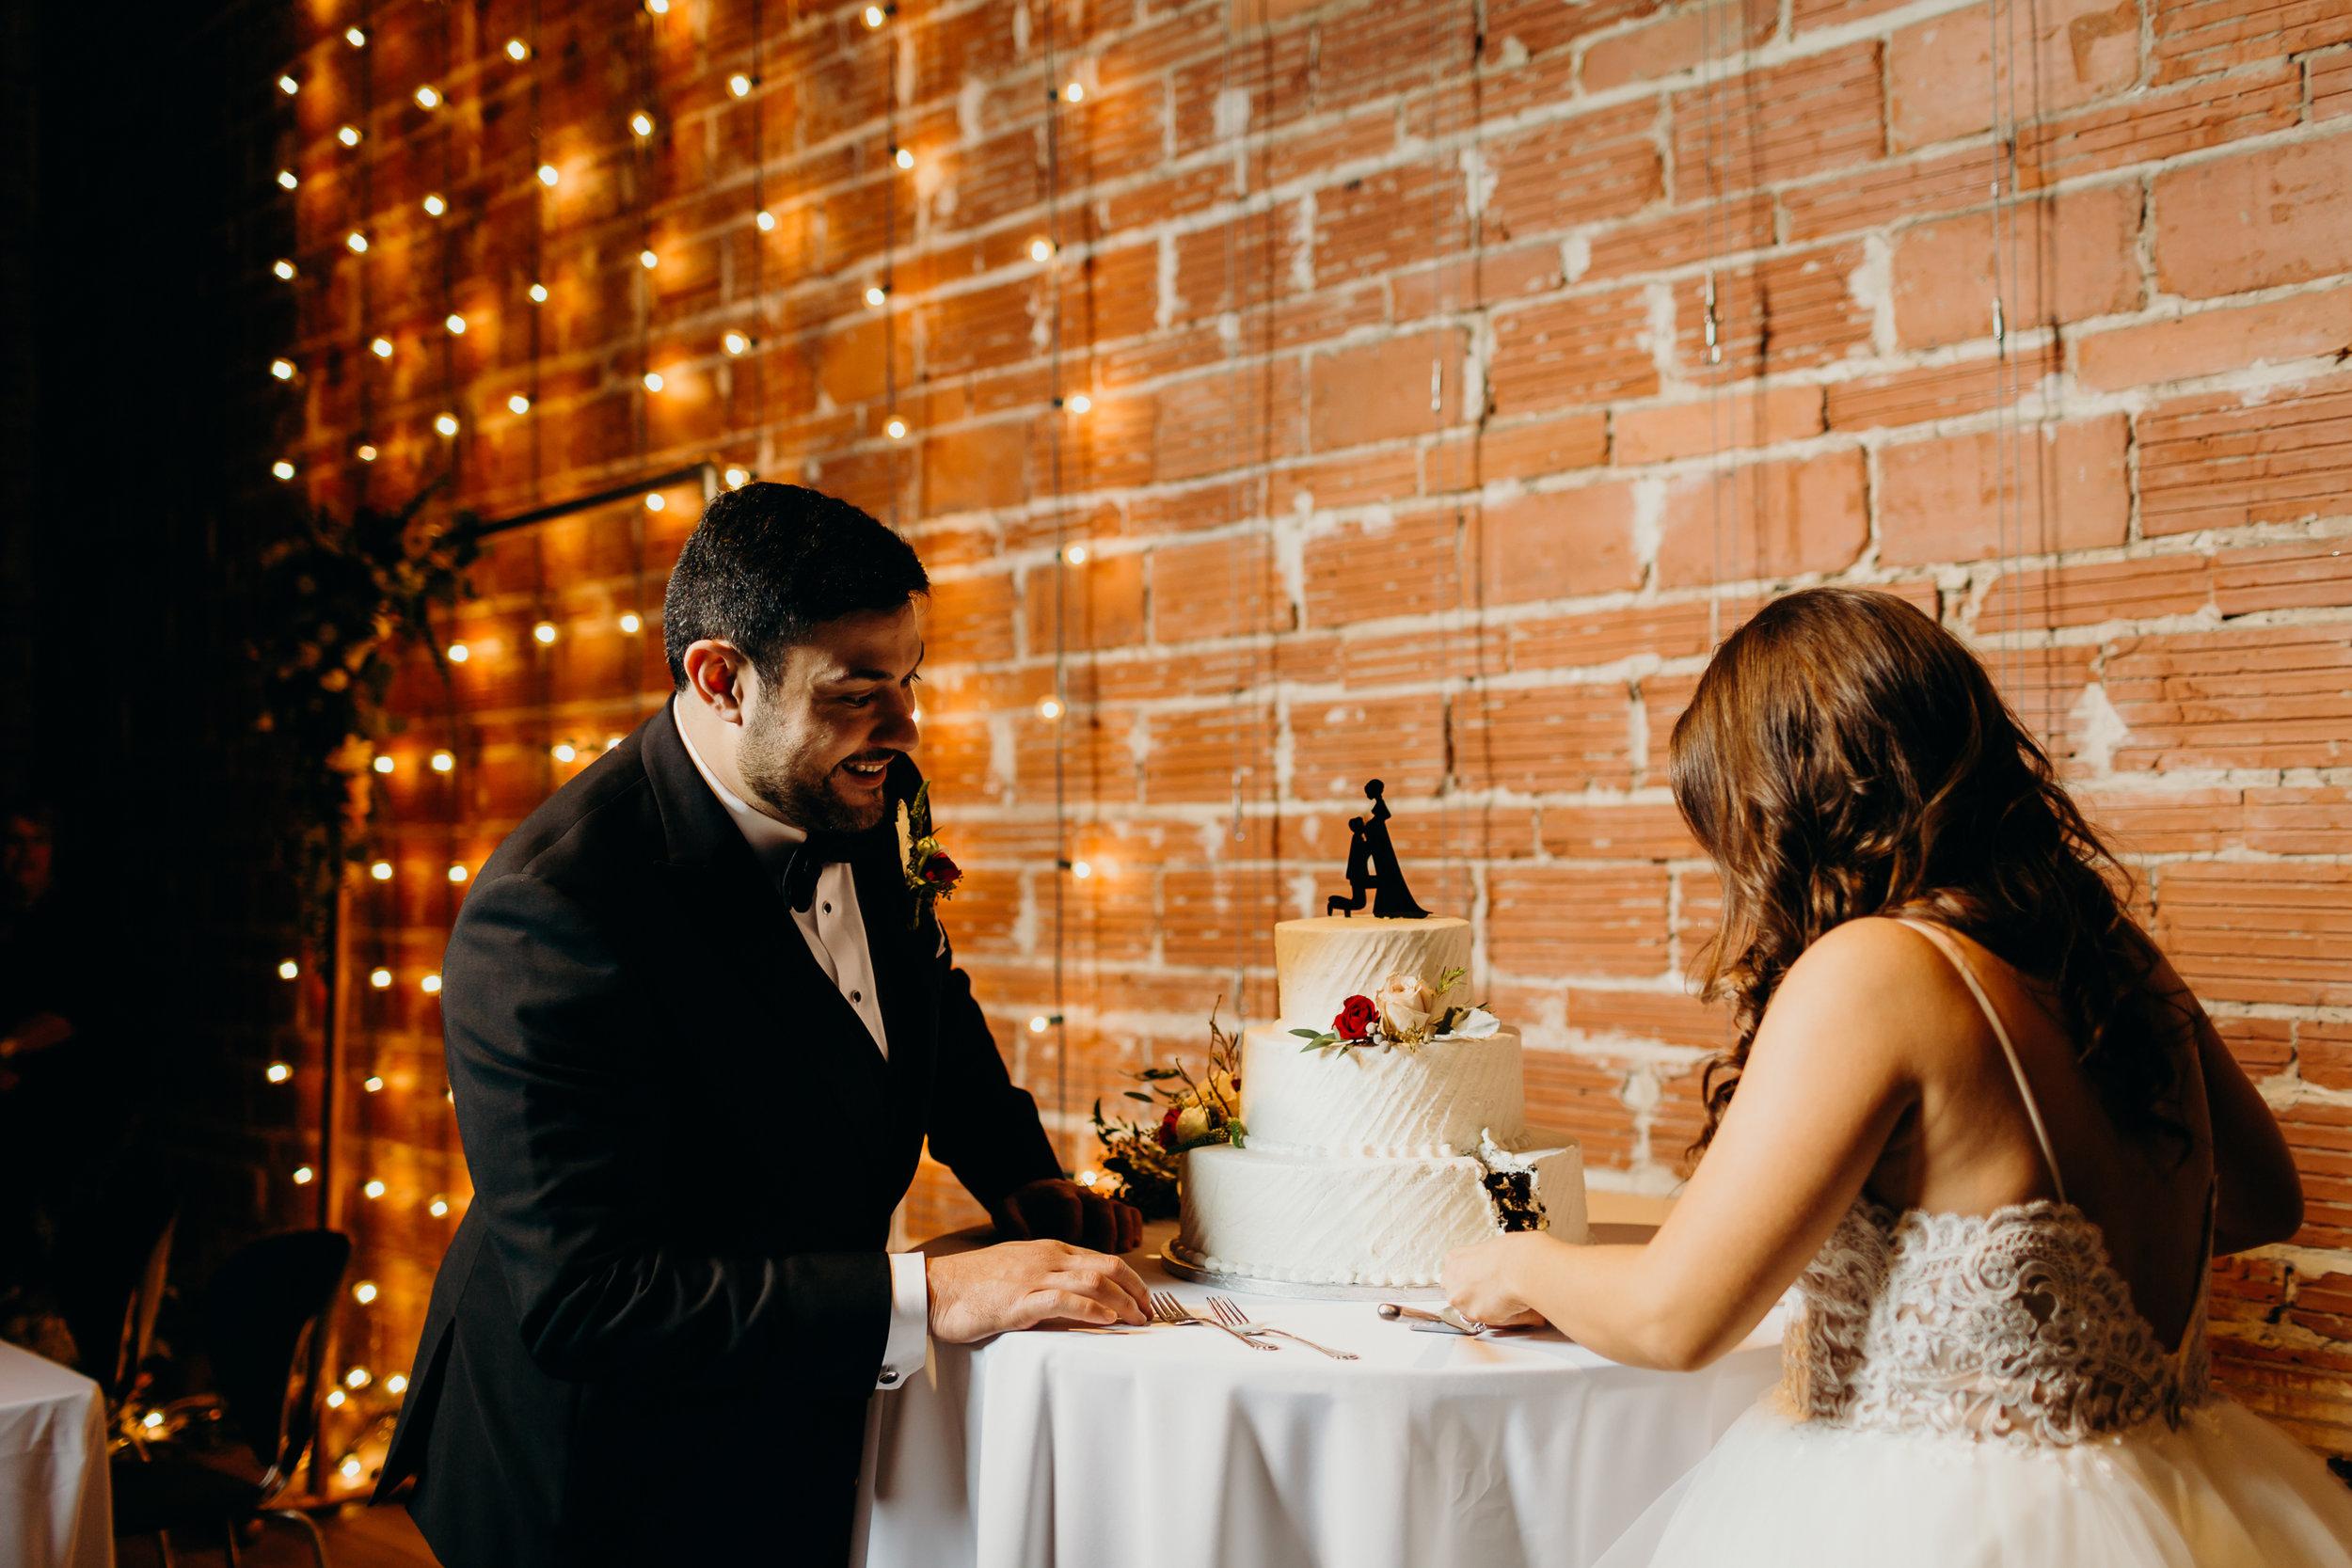 Gianna Keiko Atlanta San Francisco NYC Wedding Engagement Wedding Elopement Photographer_Sneak Peek-60.jpg